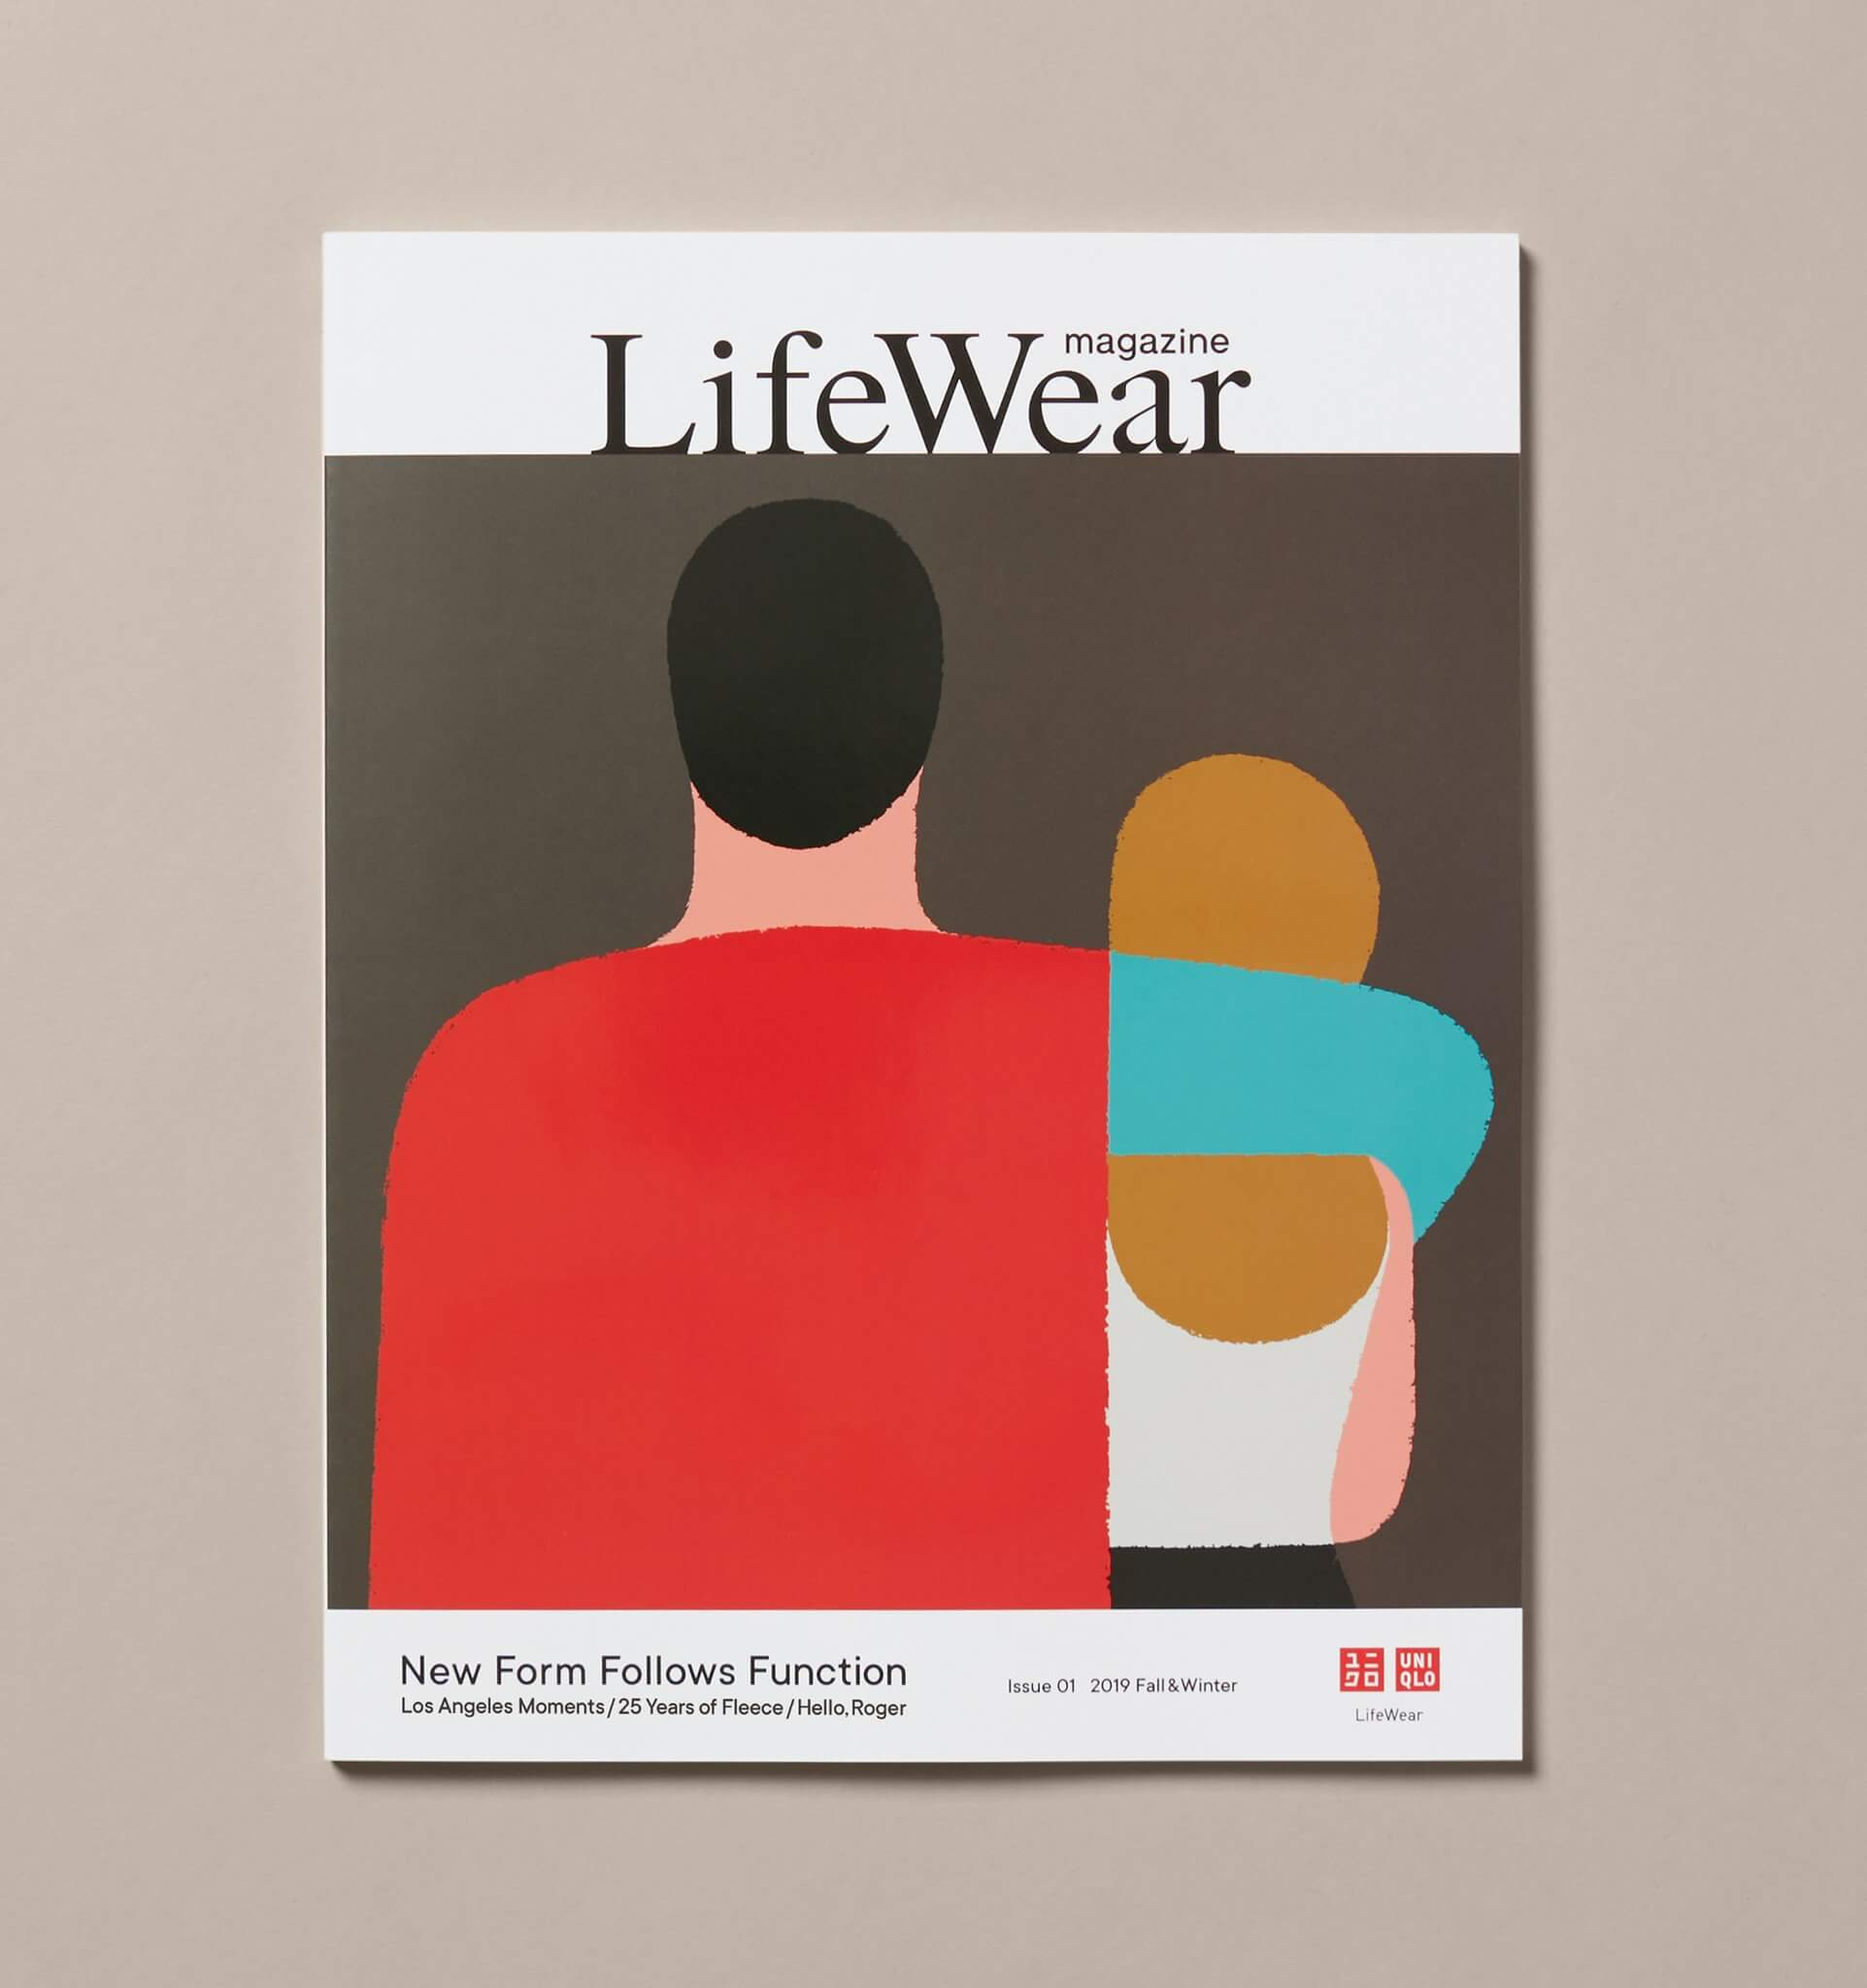 每周一书:优衣库《LifeWear magazine》